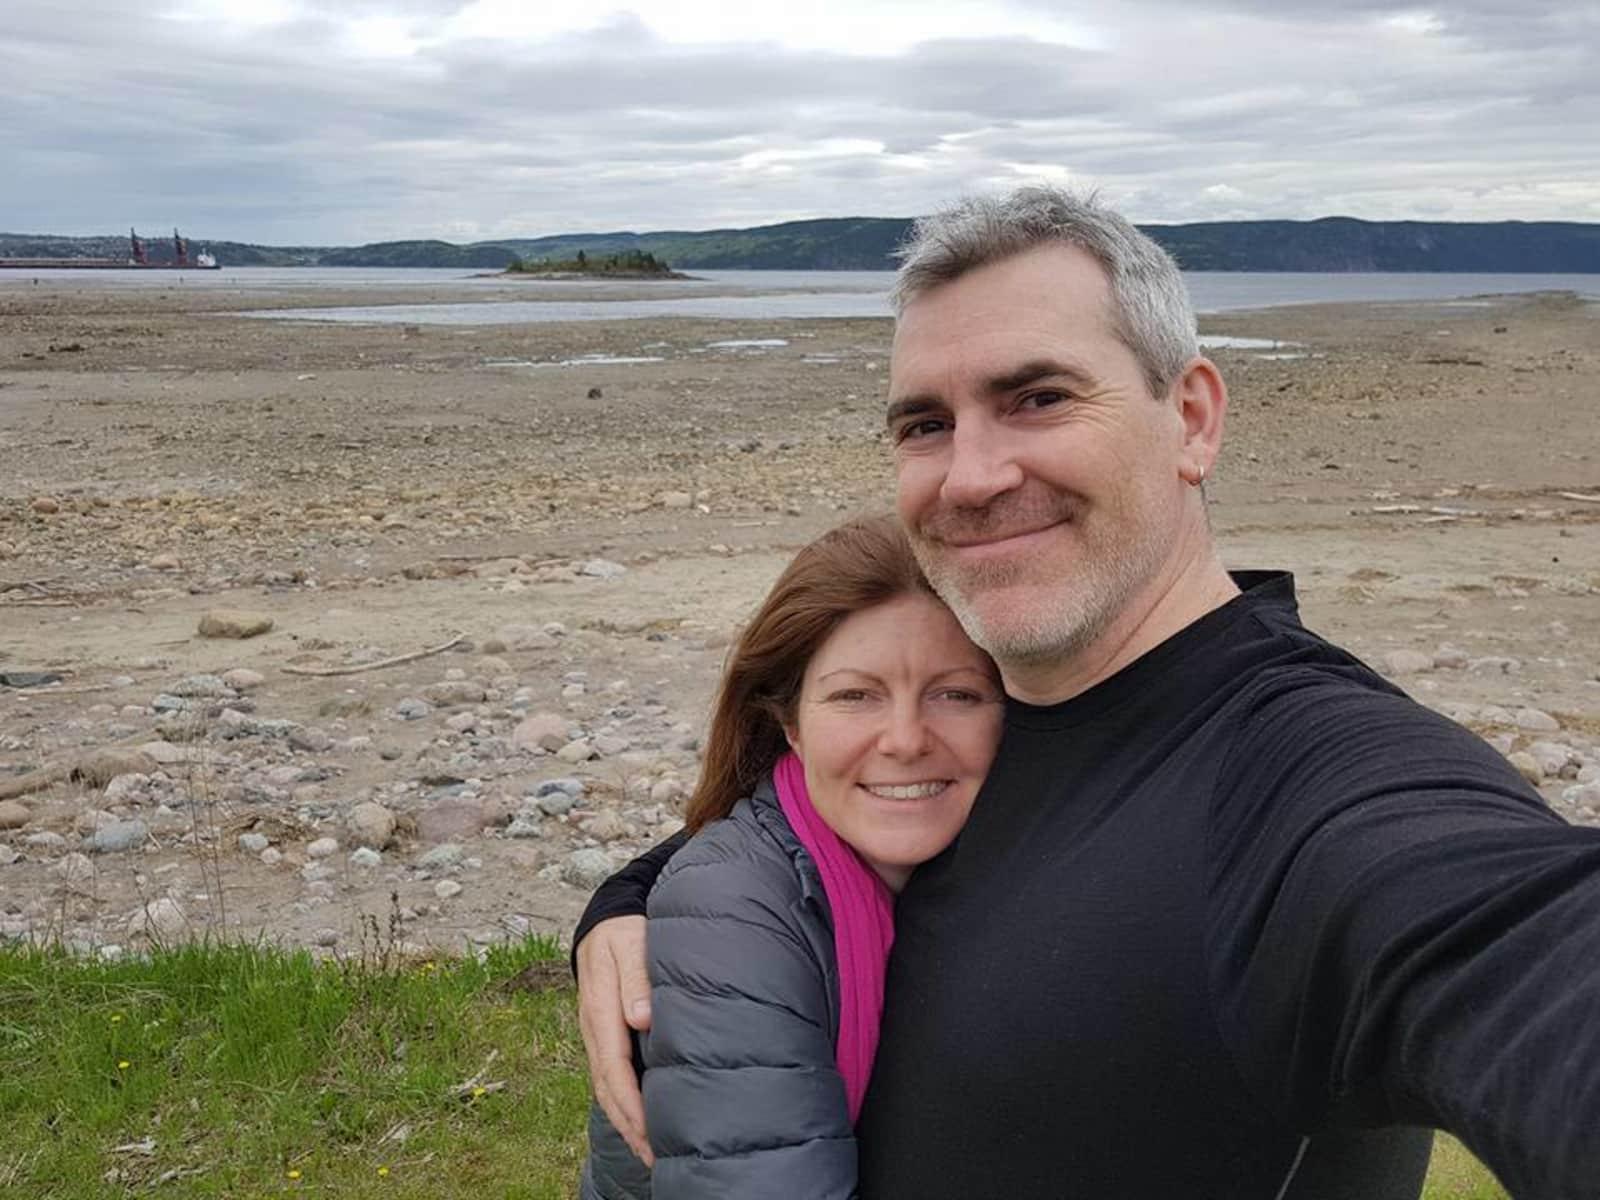 Alison & David from Guelph, Ontario, Canada